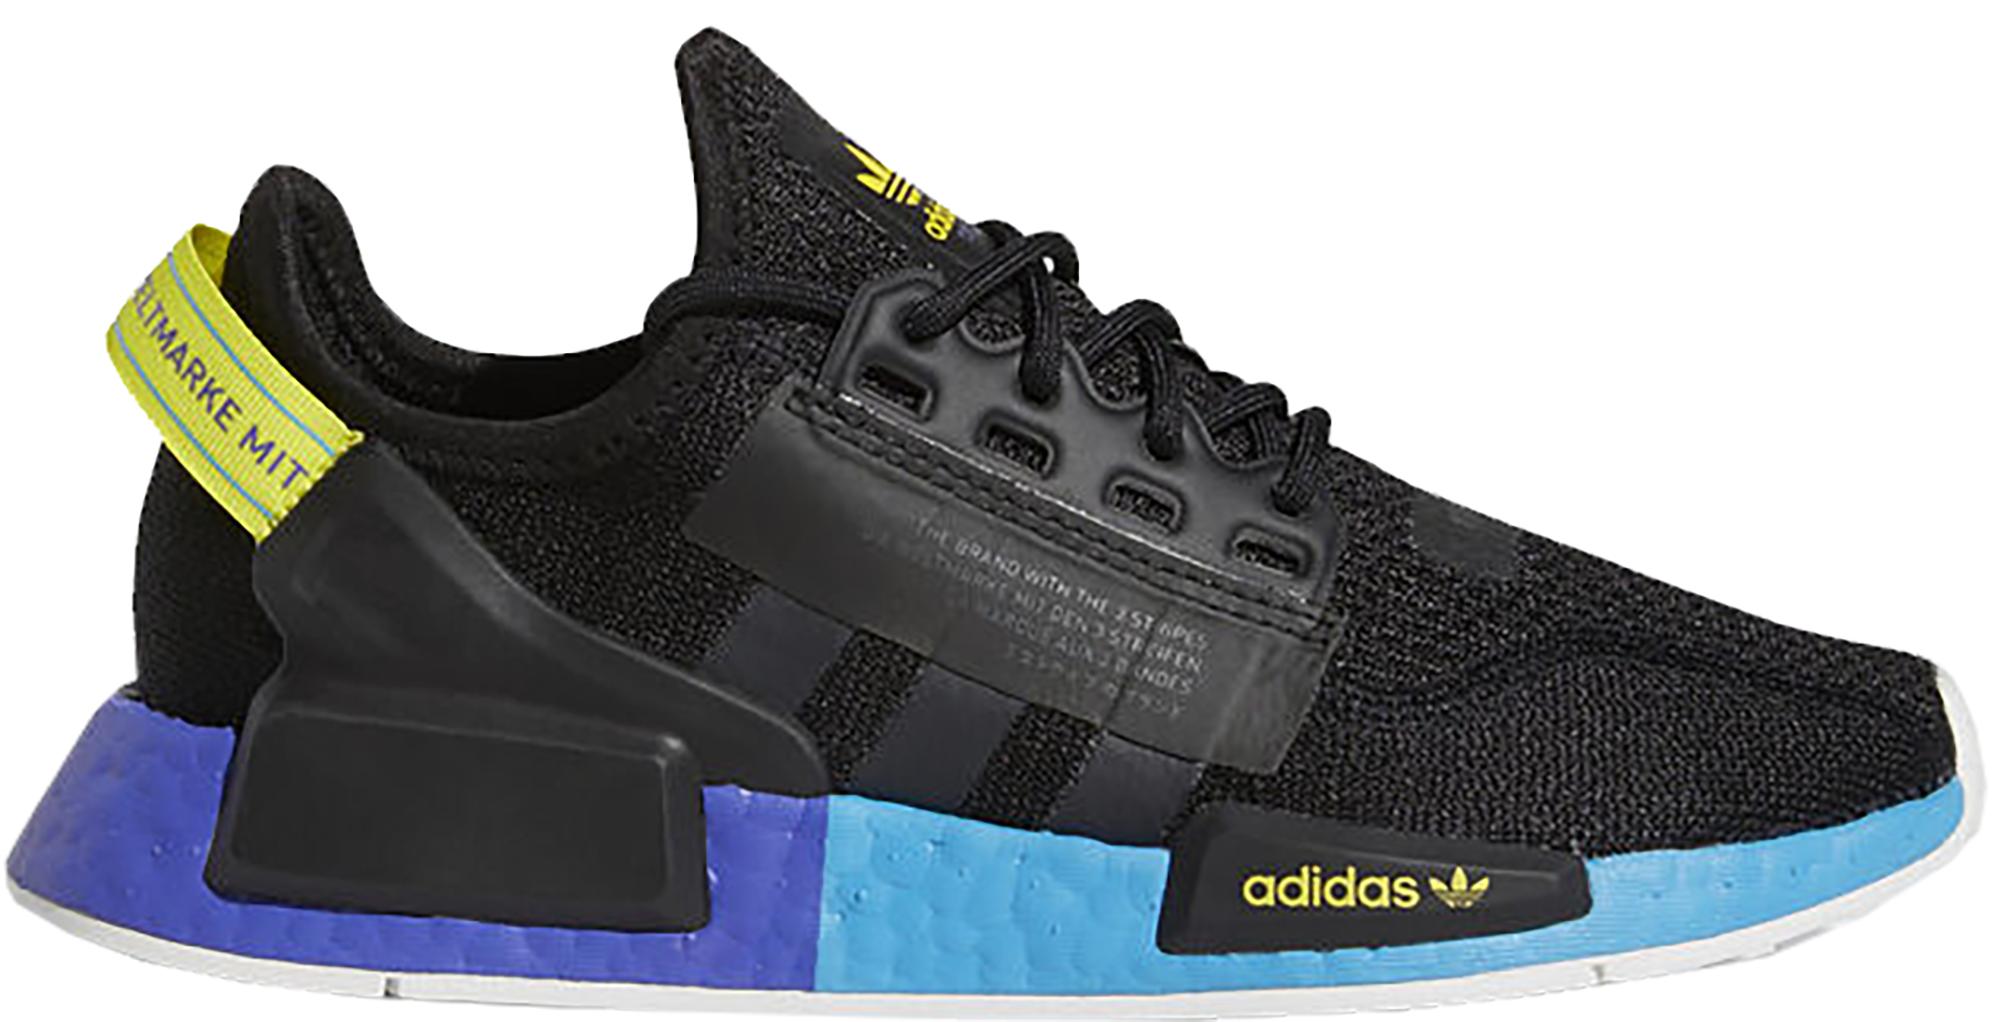 adidas NMD R1 V2 Black Carbon Shock